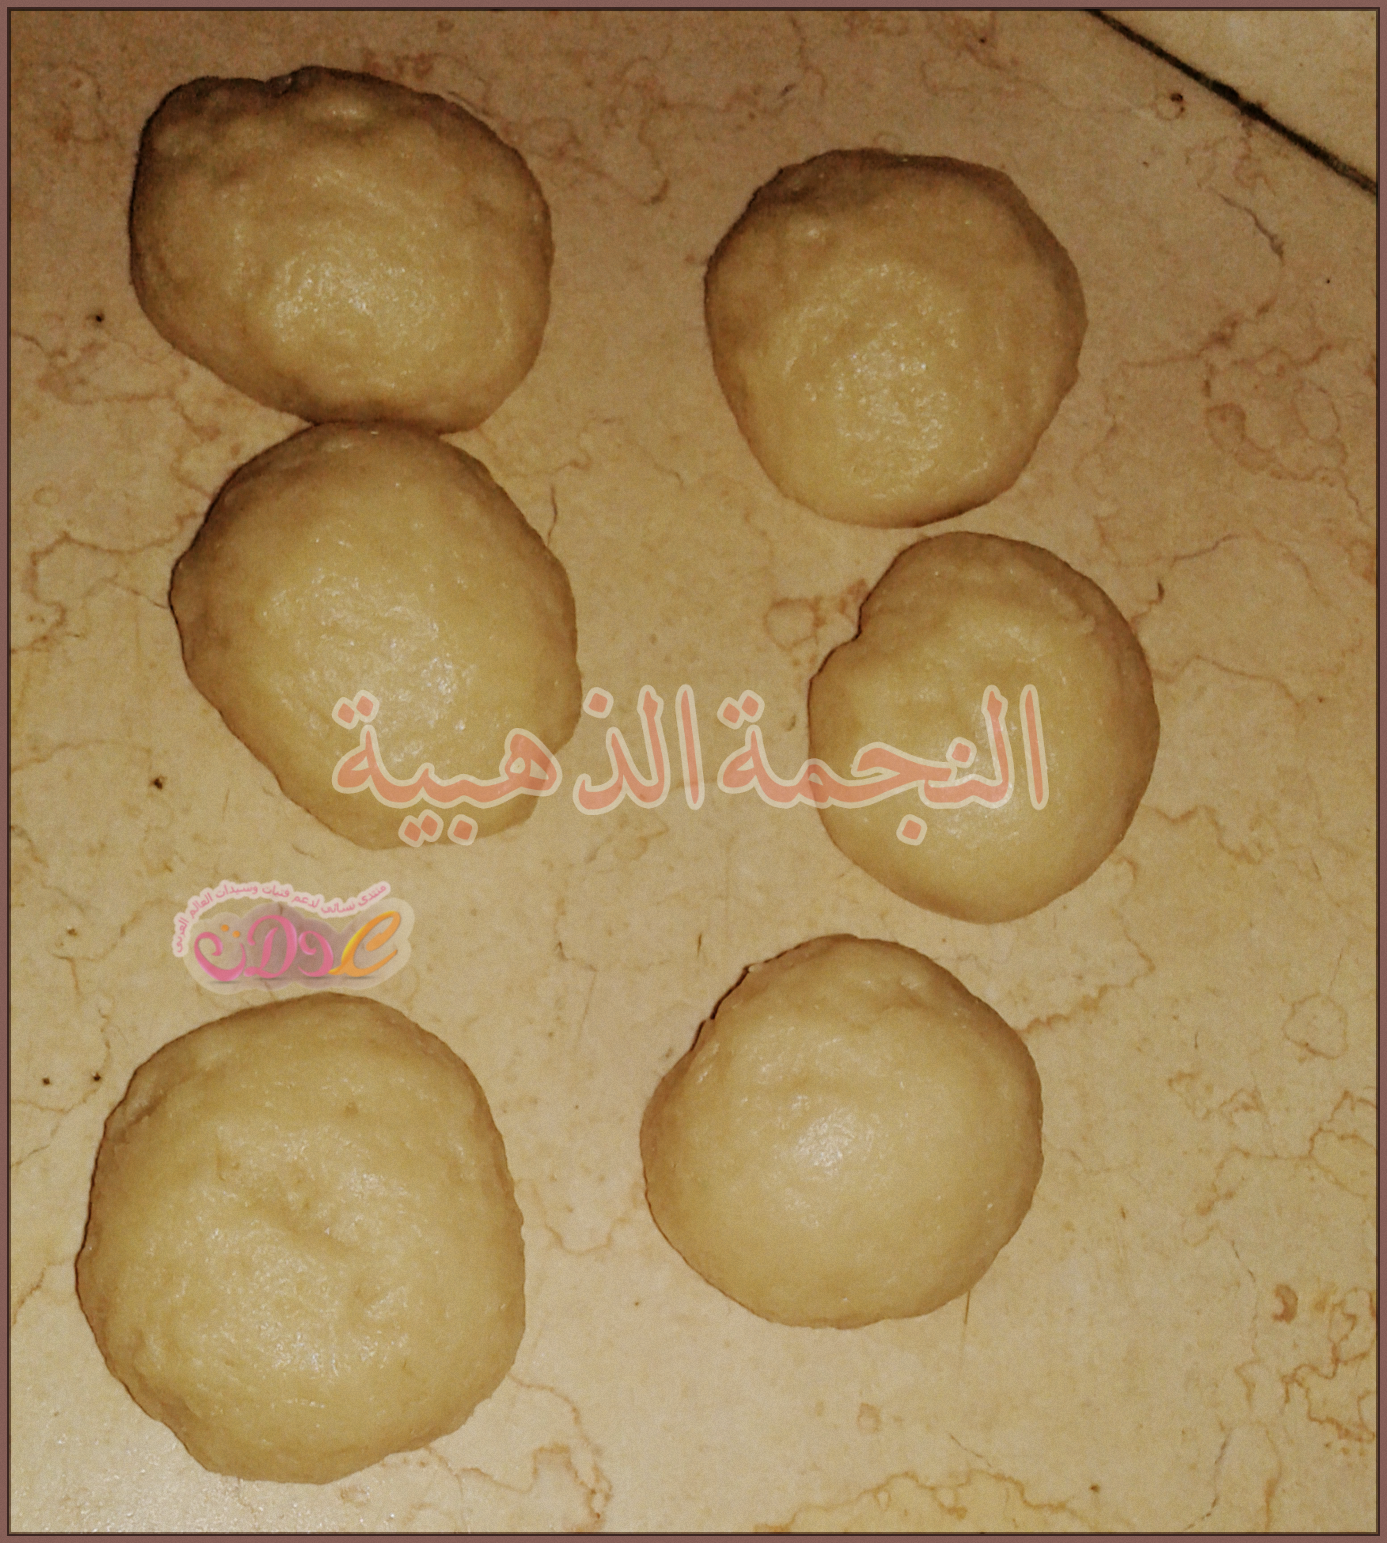 مطبخي] محشوه بالسكر .قرص بالسمسم لذيذه 3dlat.com_07_18_82df